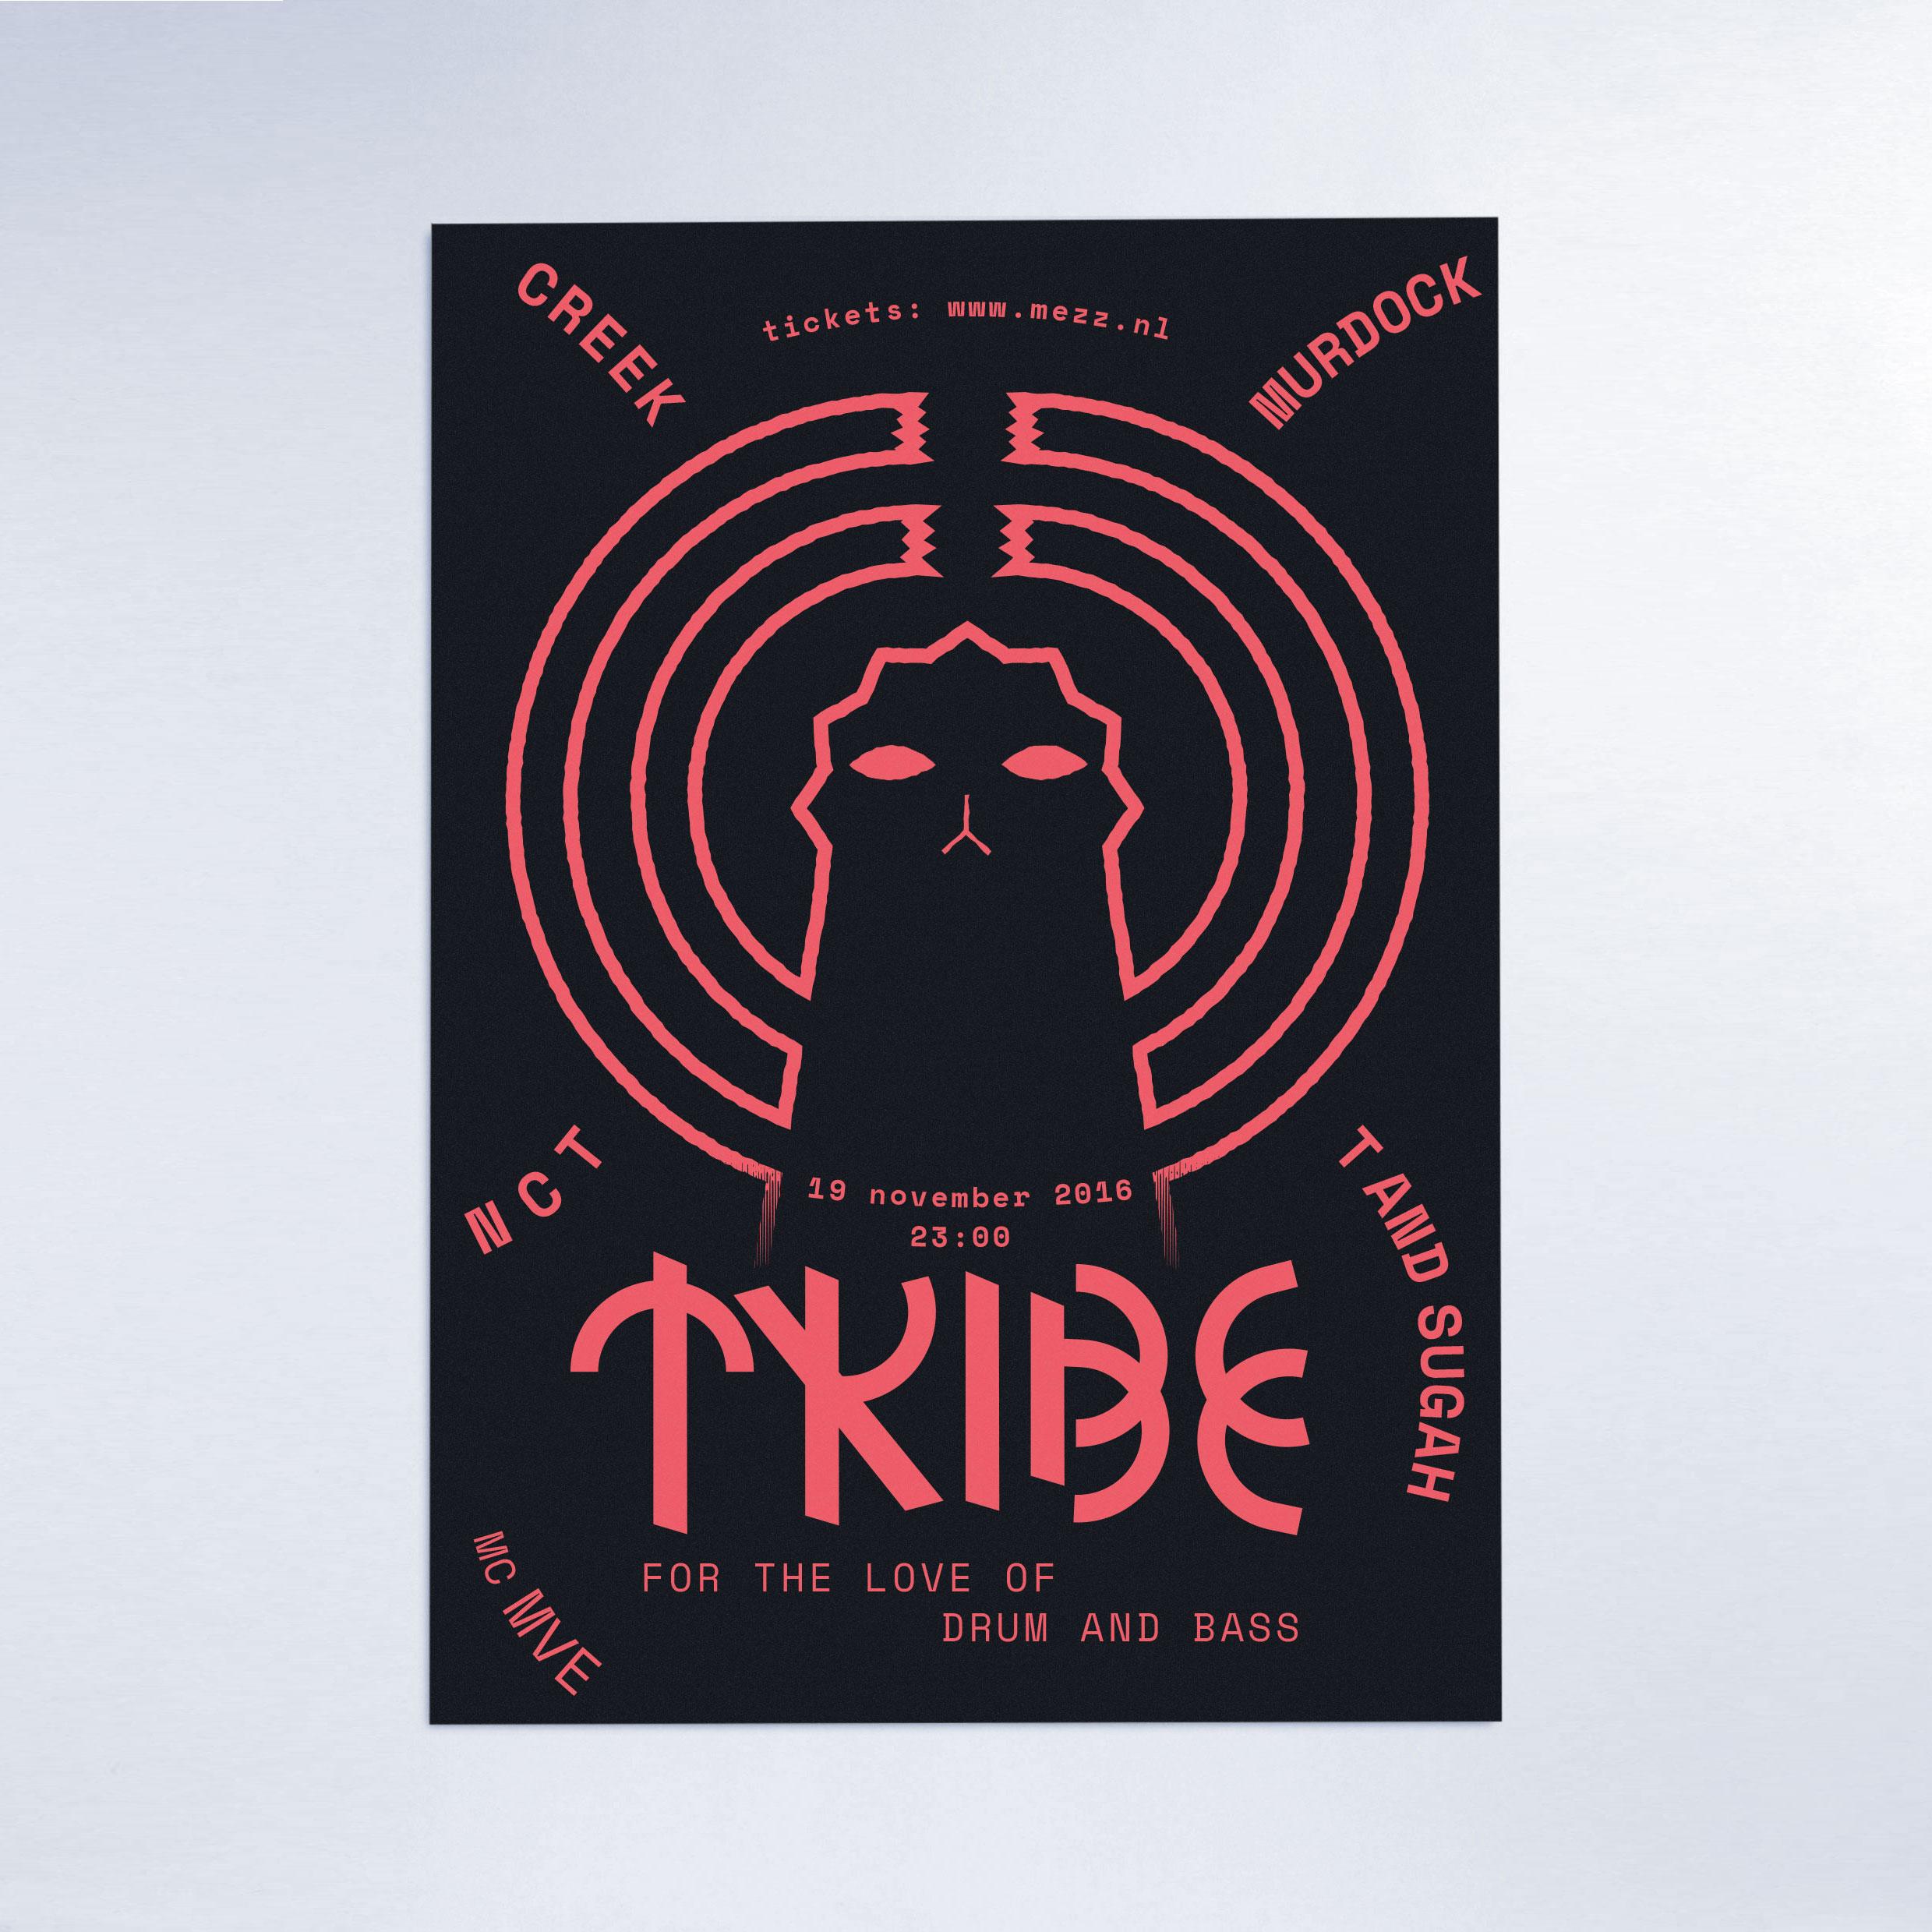 poster-mock-tribe-2